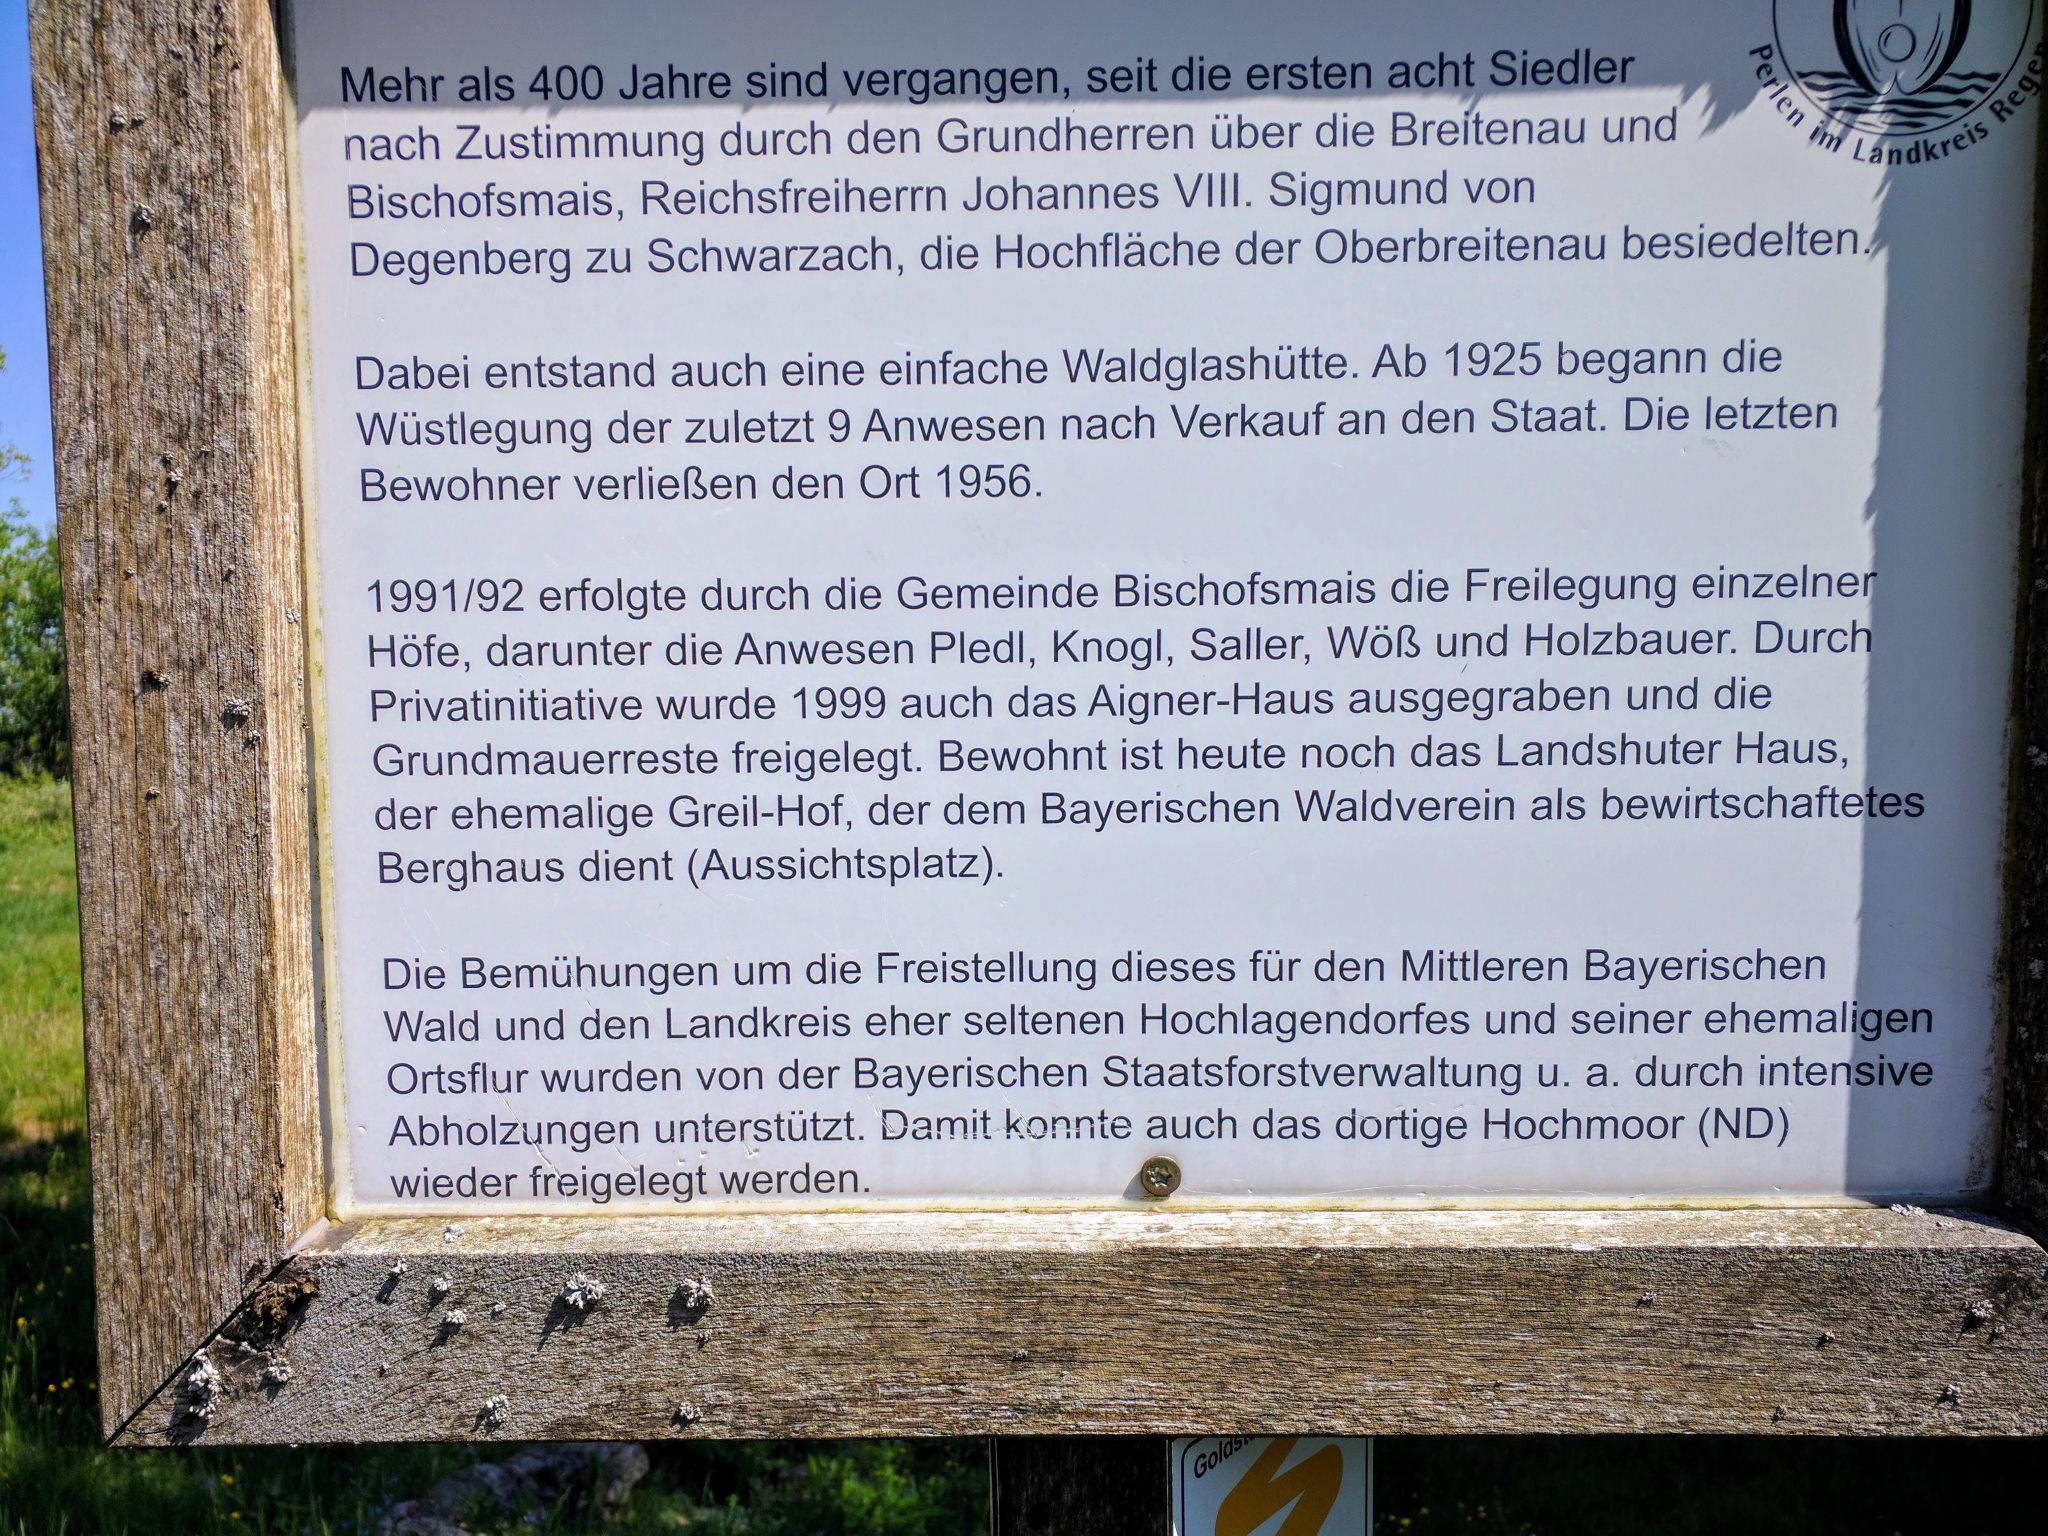 Oberbreitenau